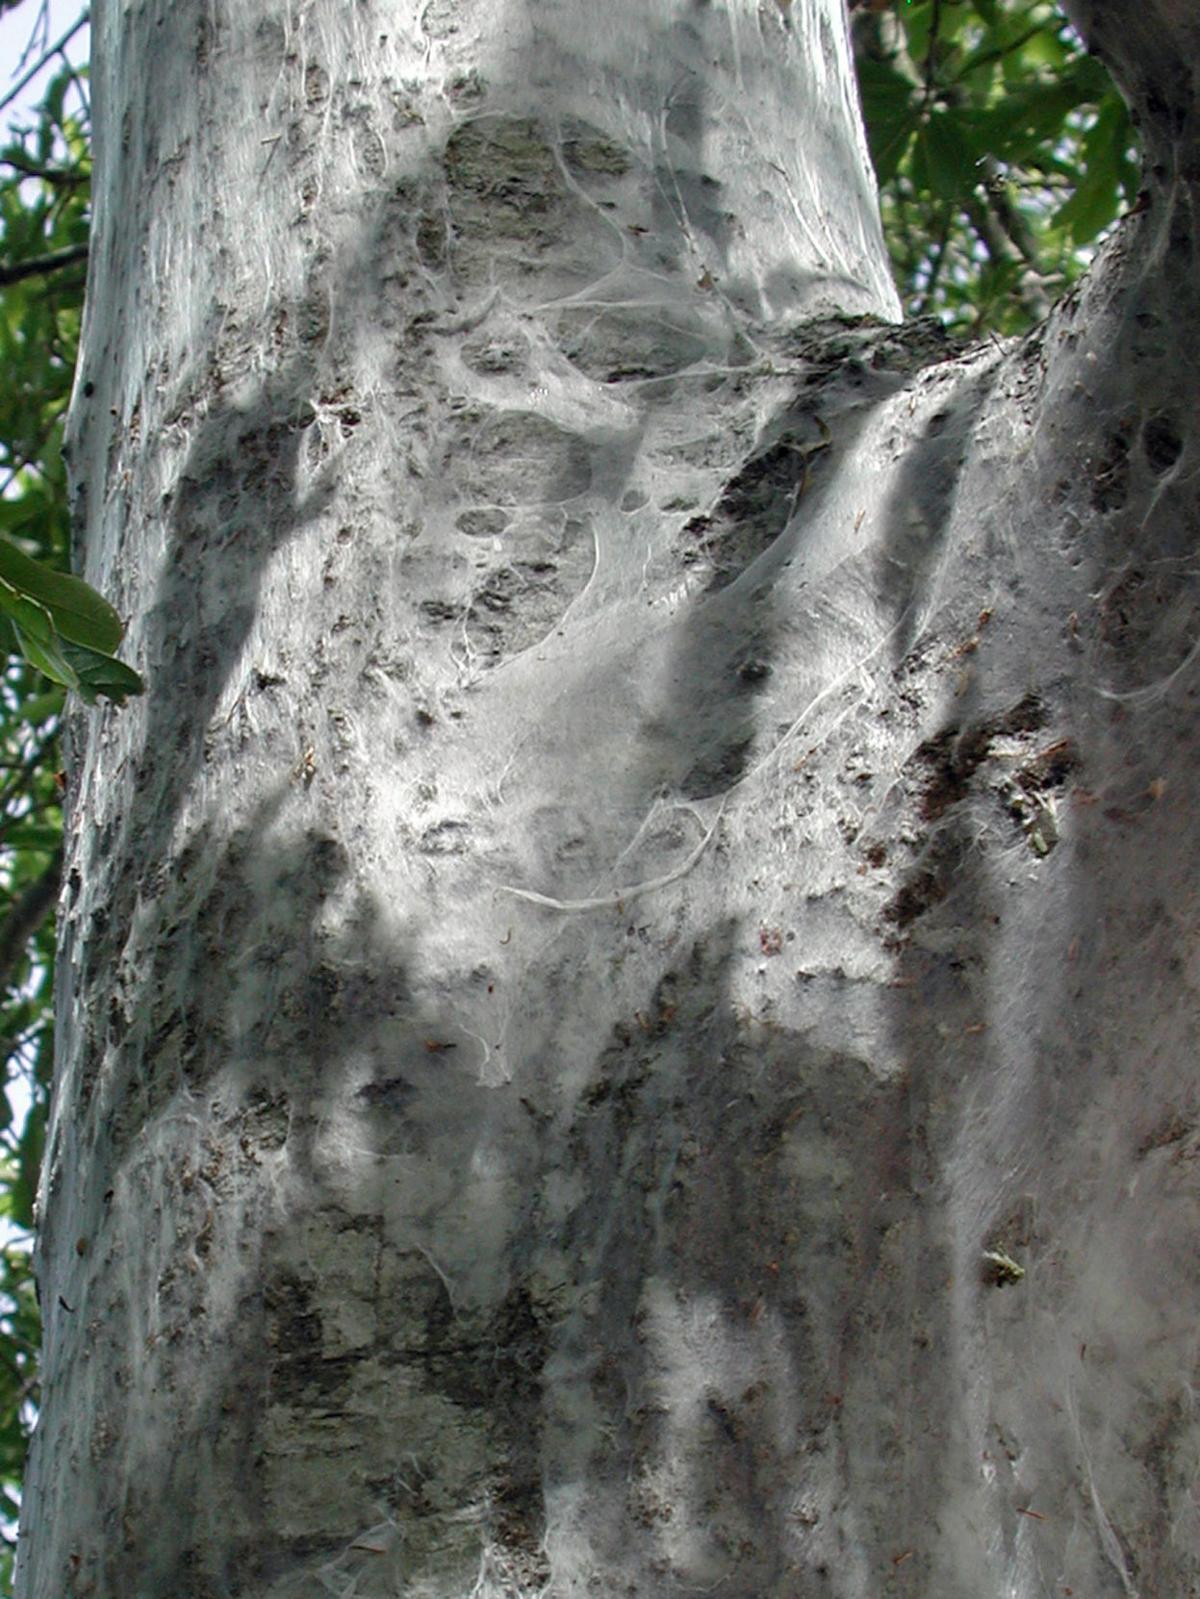 Barklice on trees